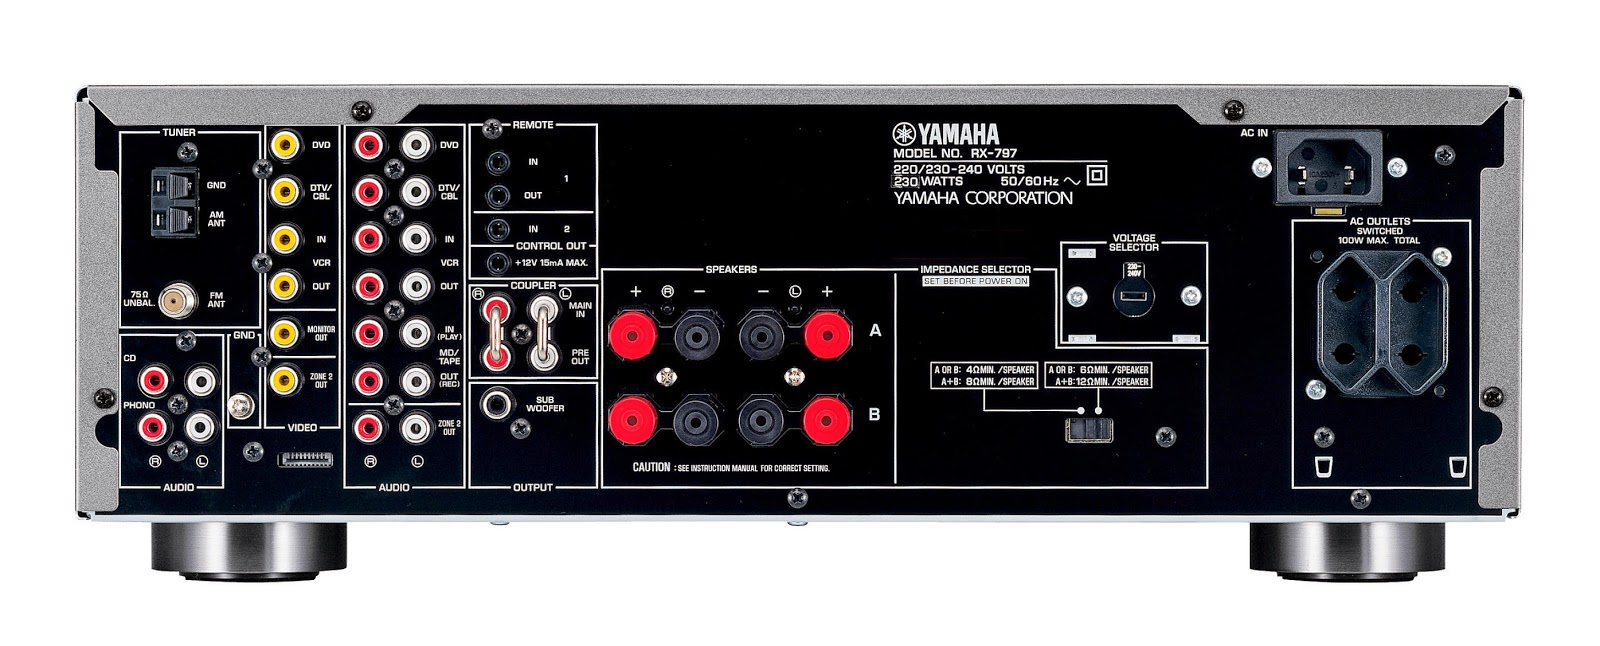 yamaha rx v340 service manual download free wrg 7488 whole home audio wiring diagram yamaha rx a1050 rx v359 yamaha av receivers service manual ampli  [ 1600 x 646 Pixel ]